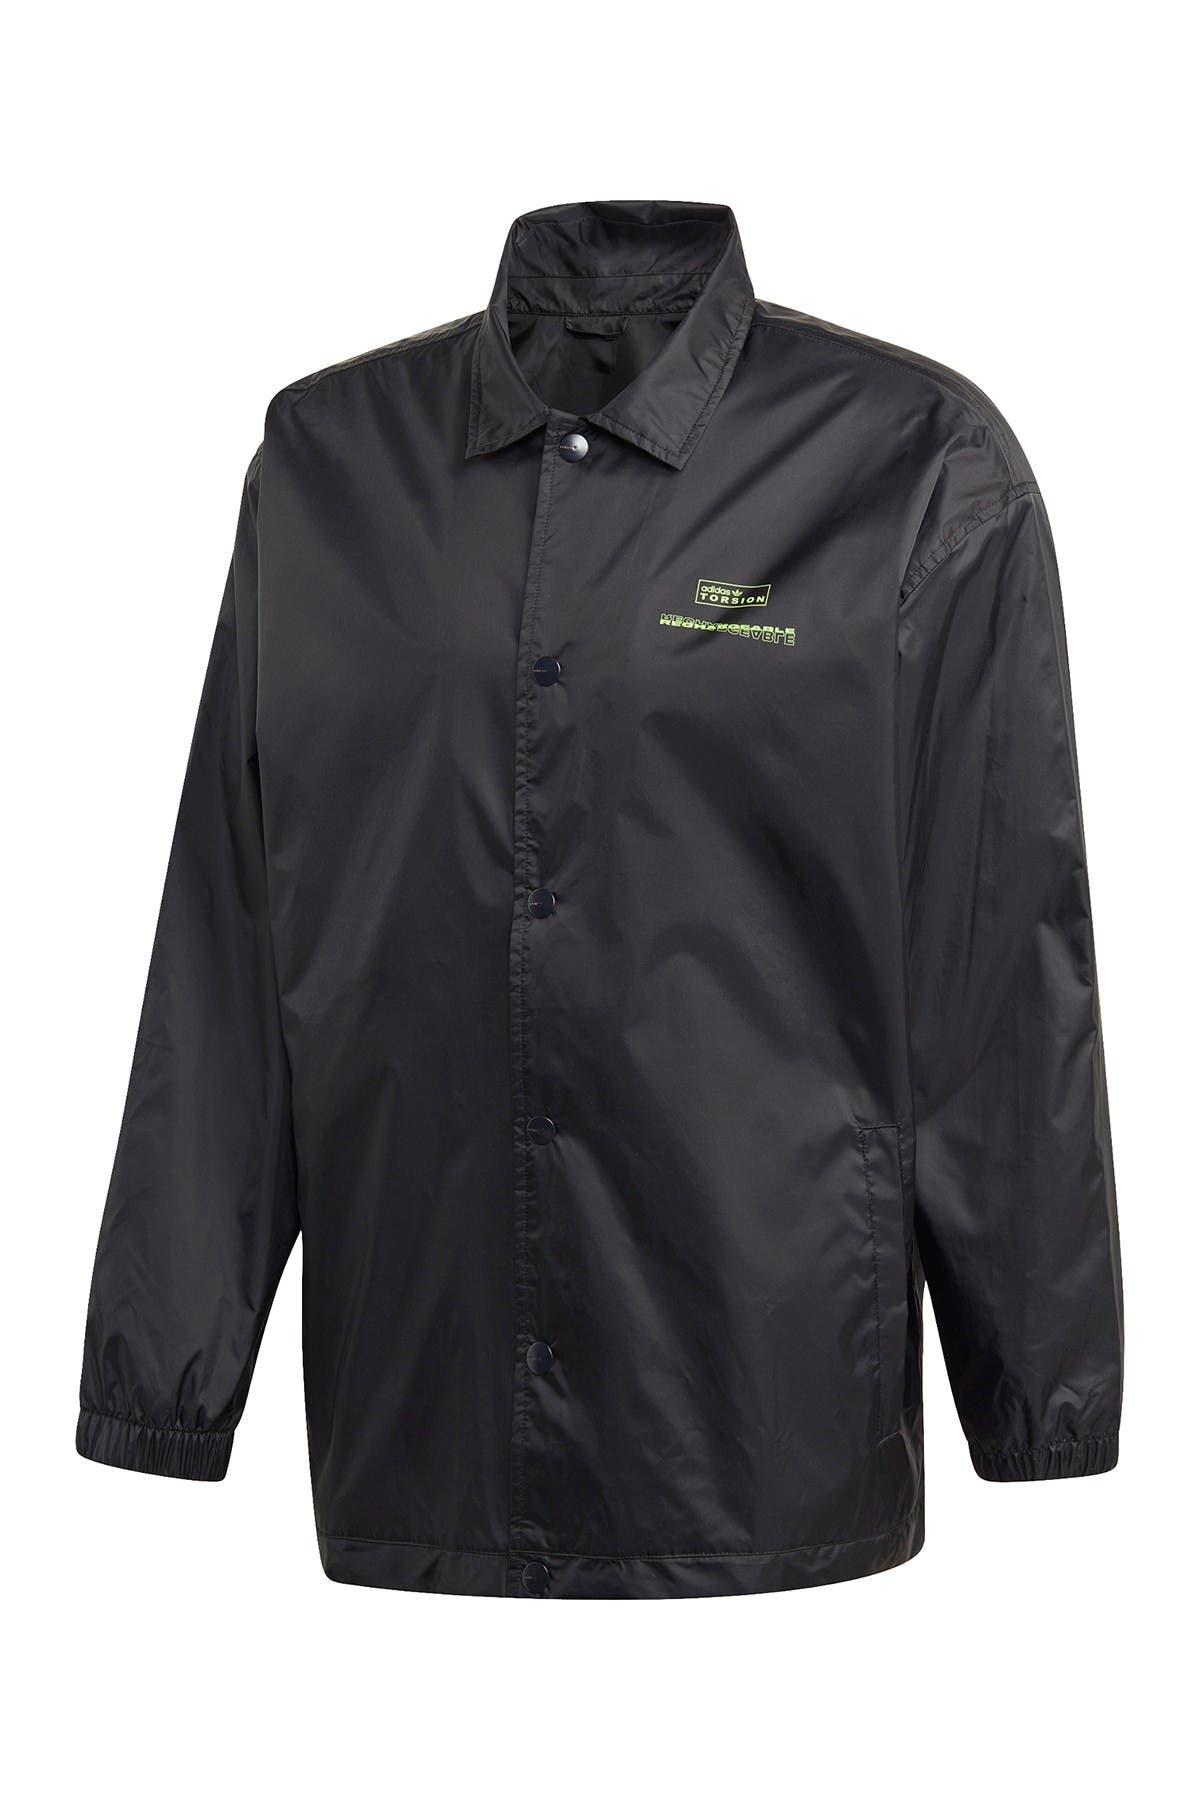 Image of adidas Torsion Coach Jacket